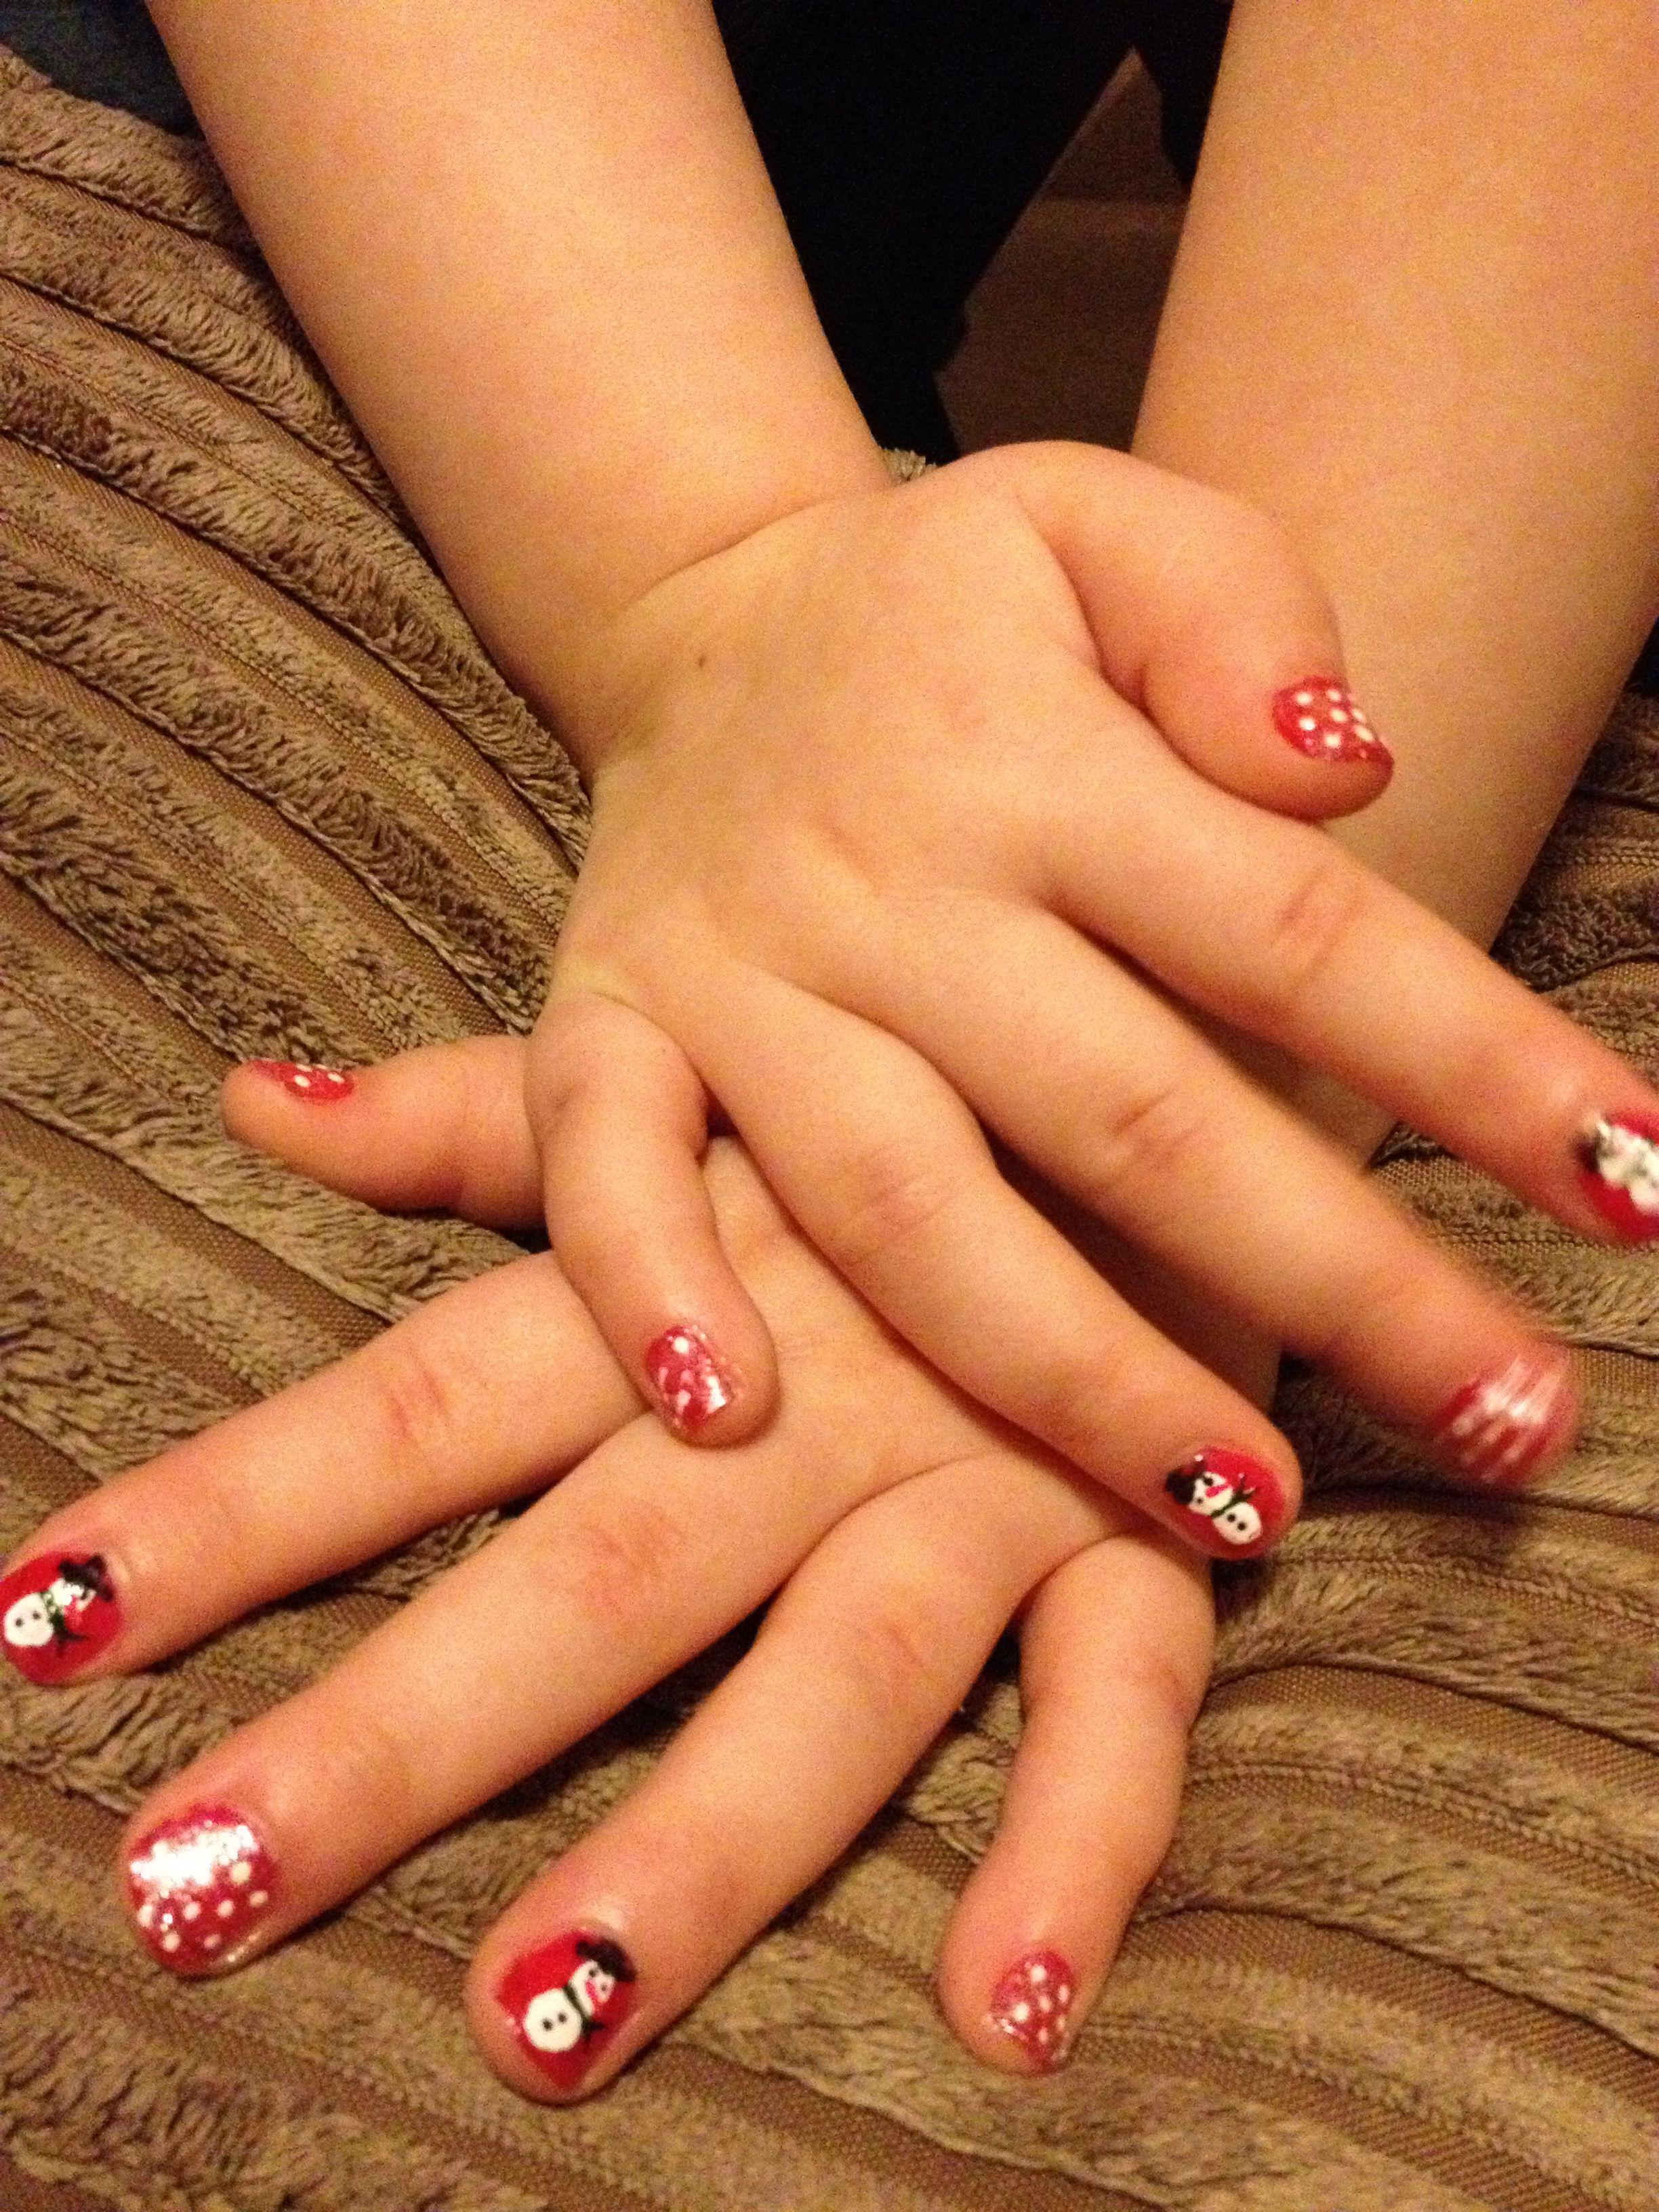 Christmas Nail Art For My Little Girl Little Girl Nails Kids Nail Designs Nails For Kids